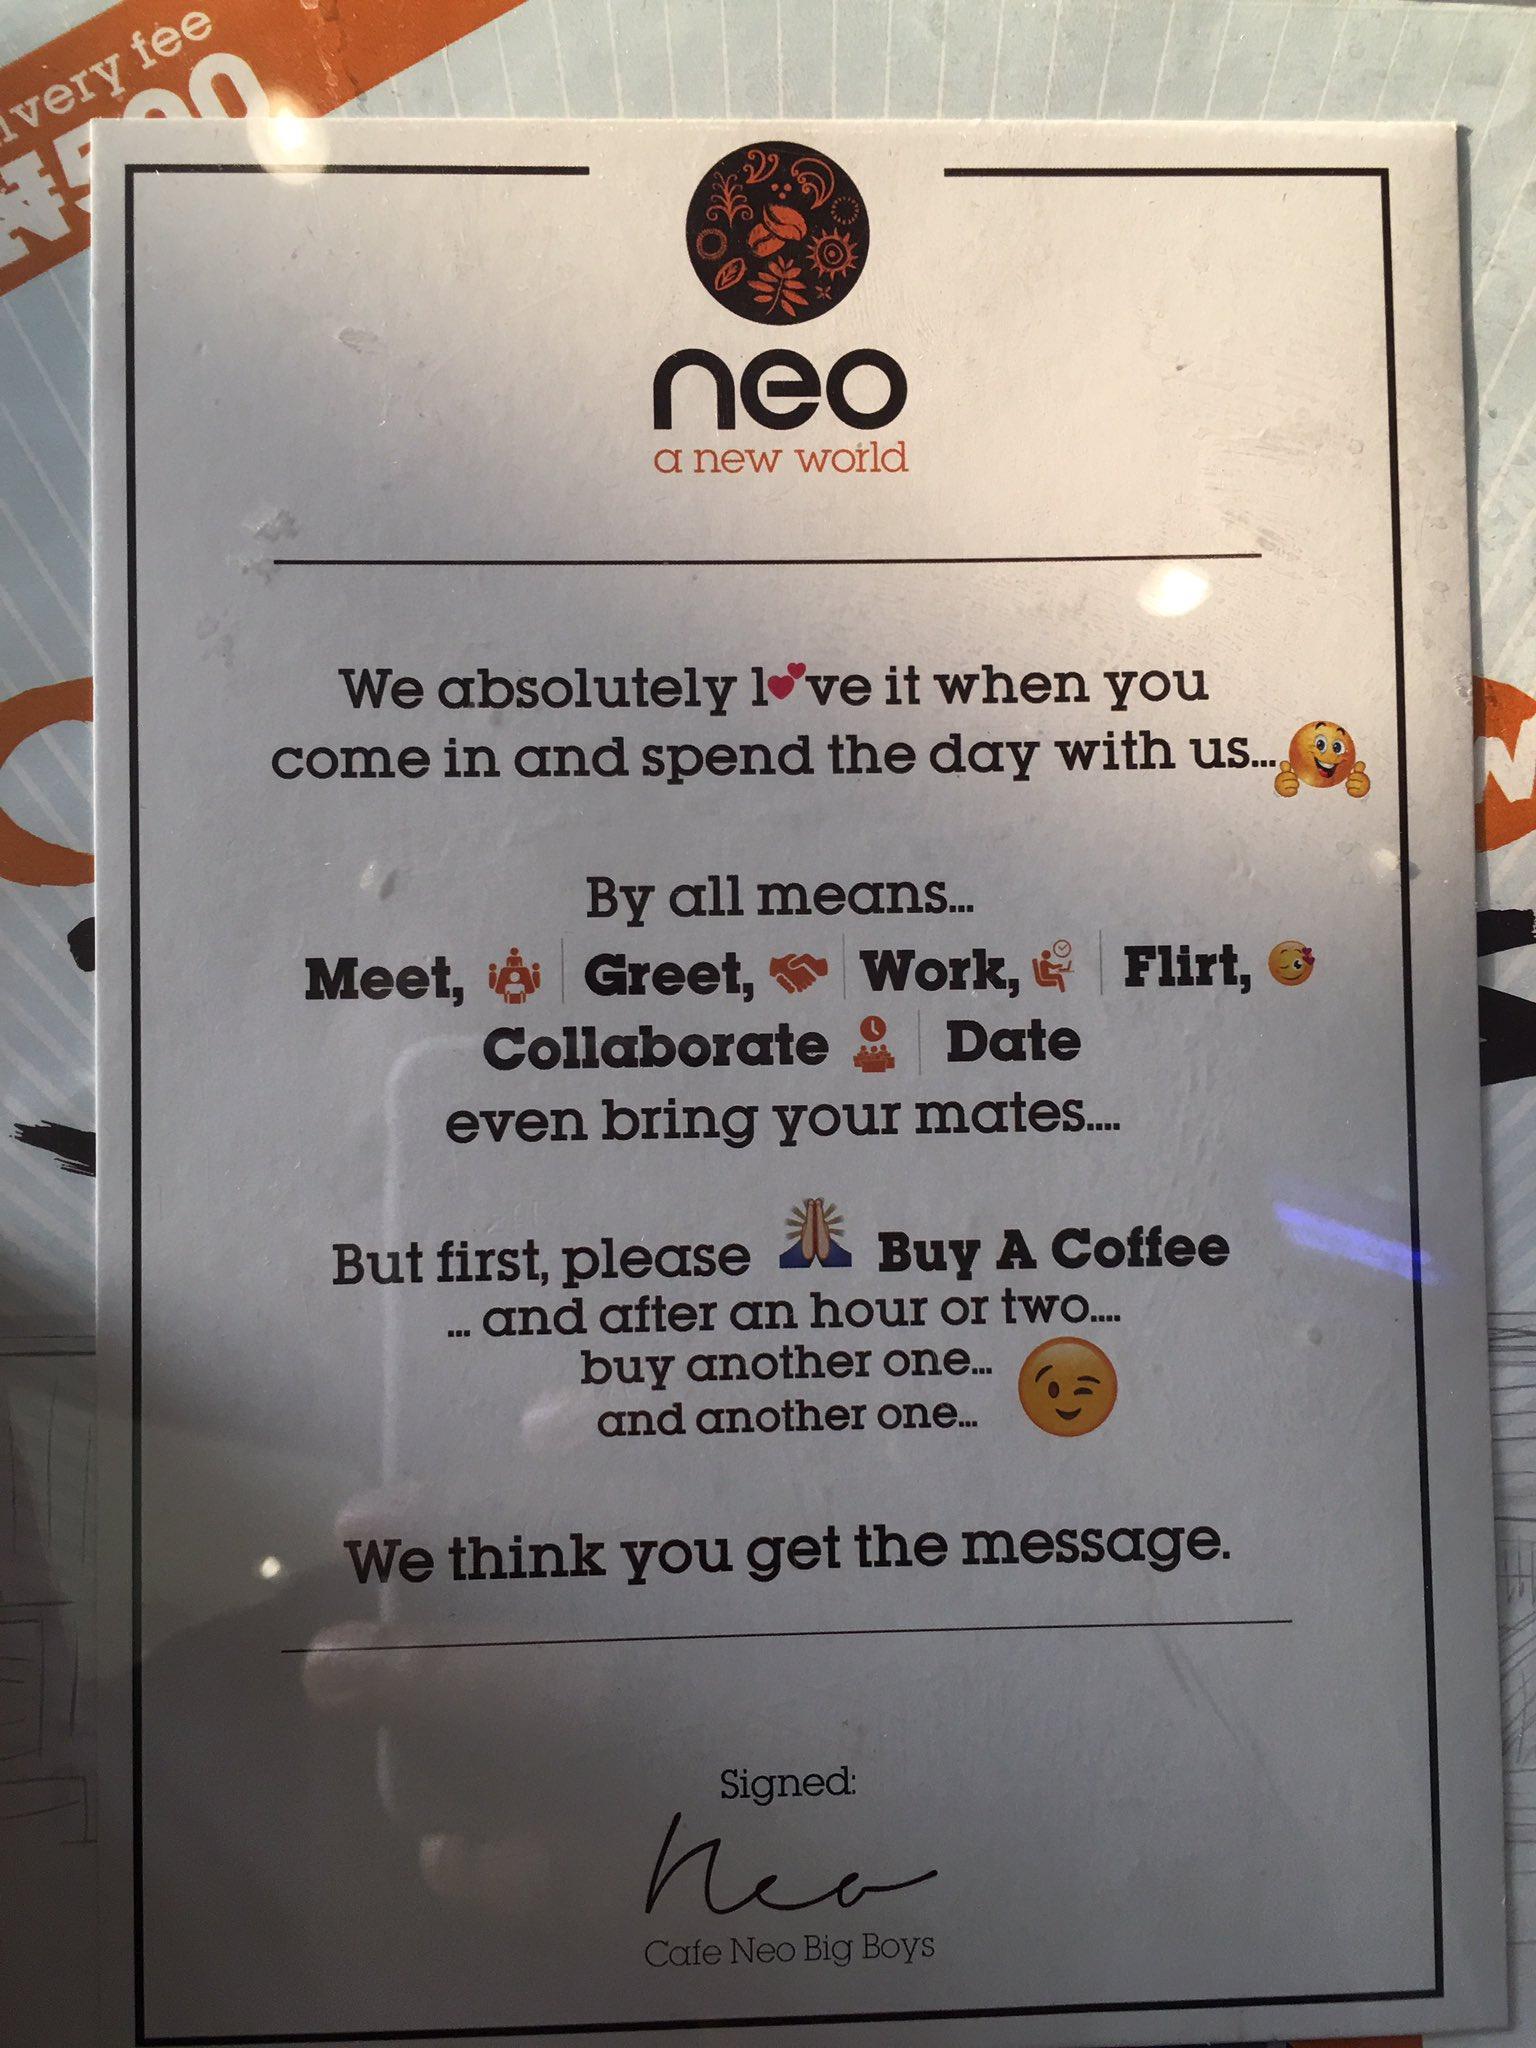 Cafe Neo